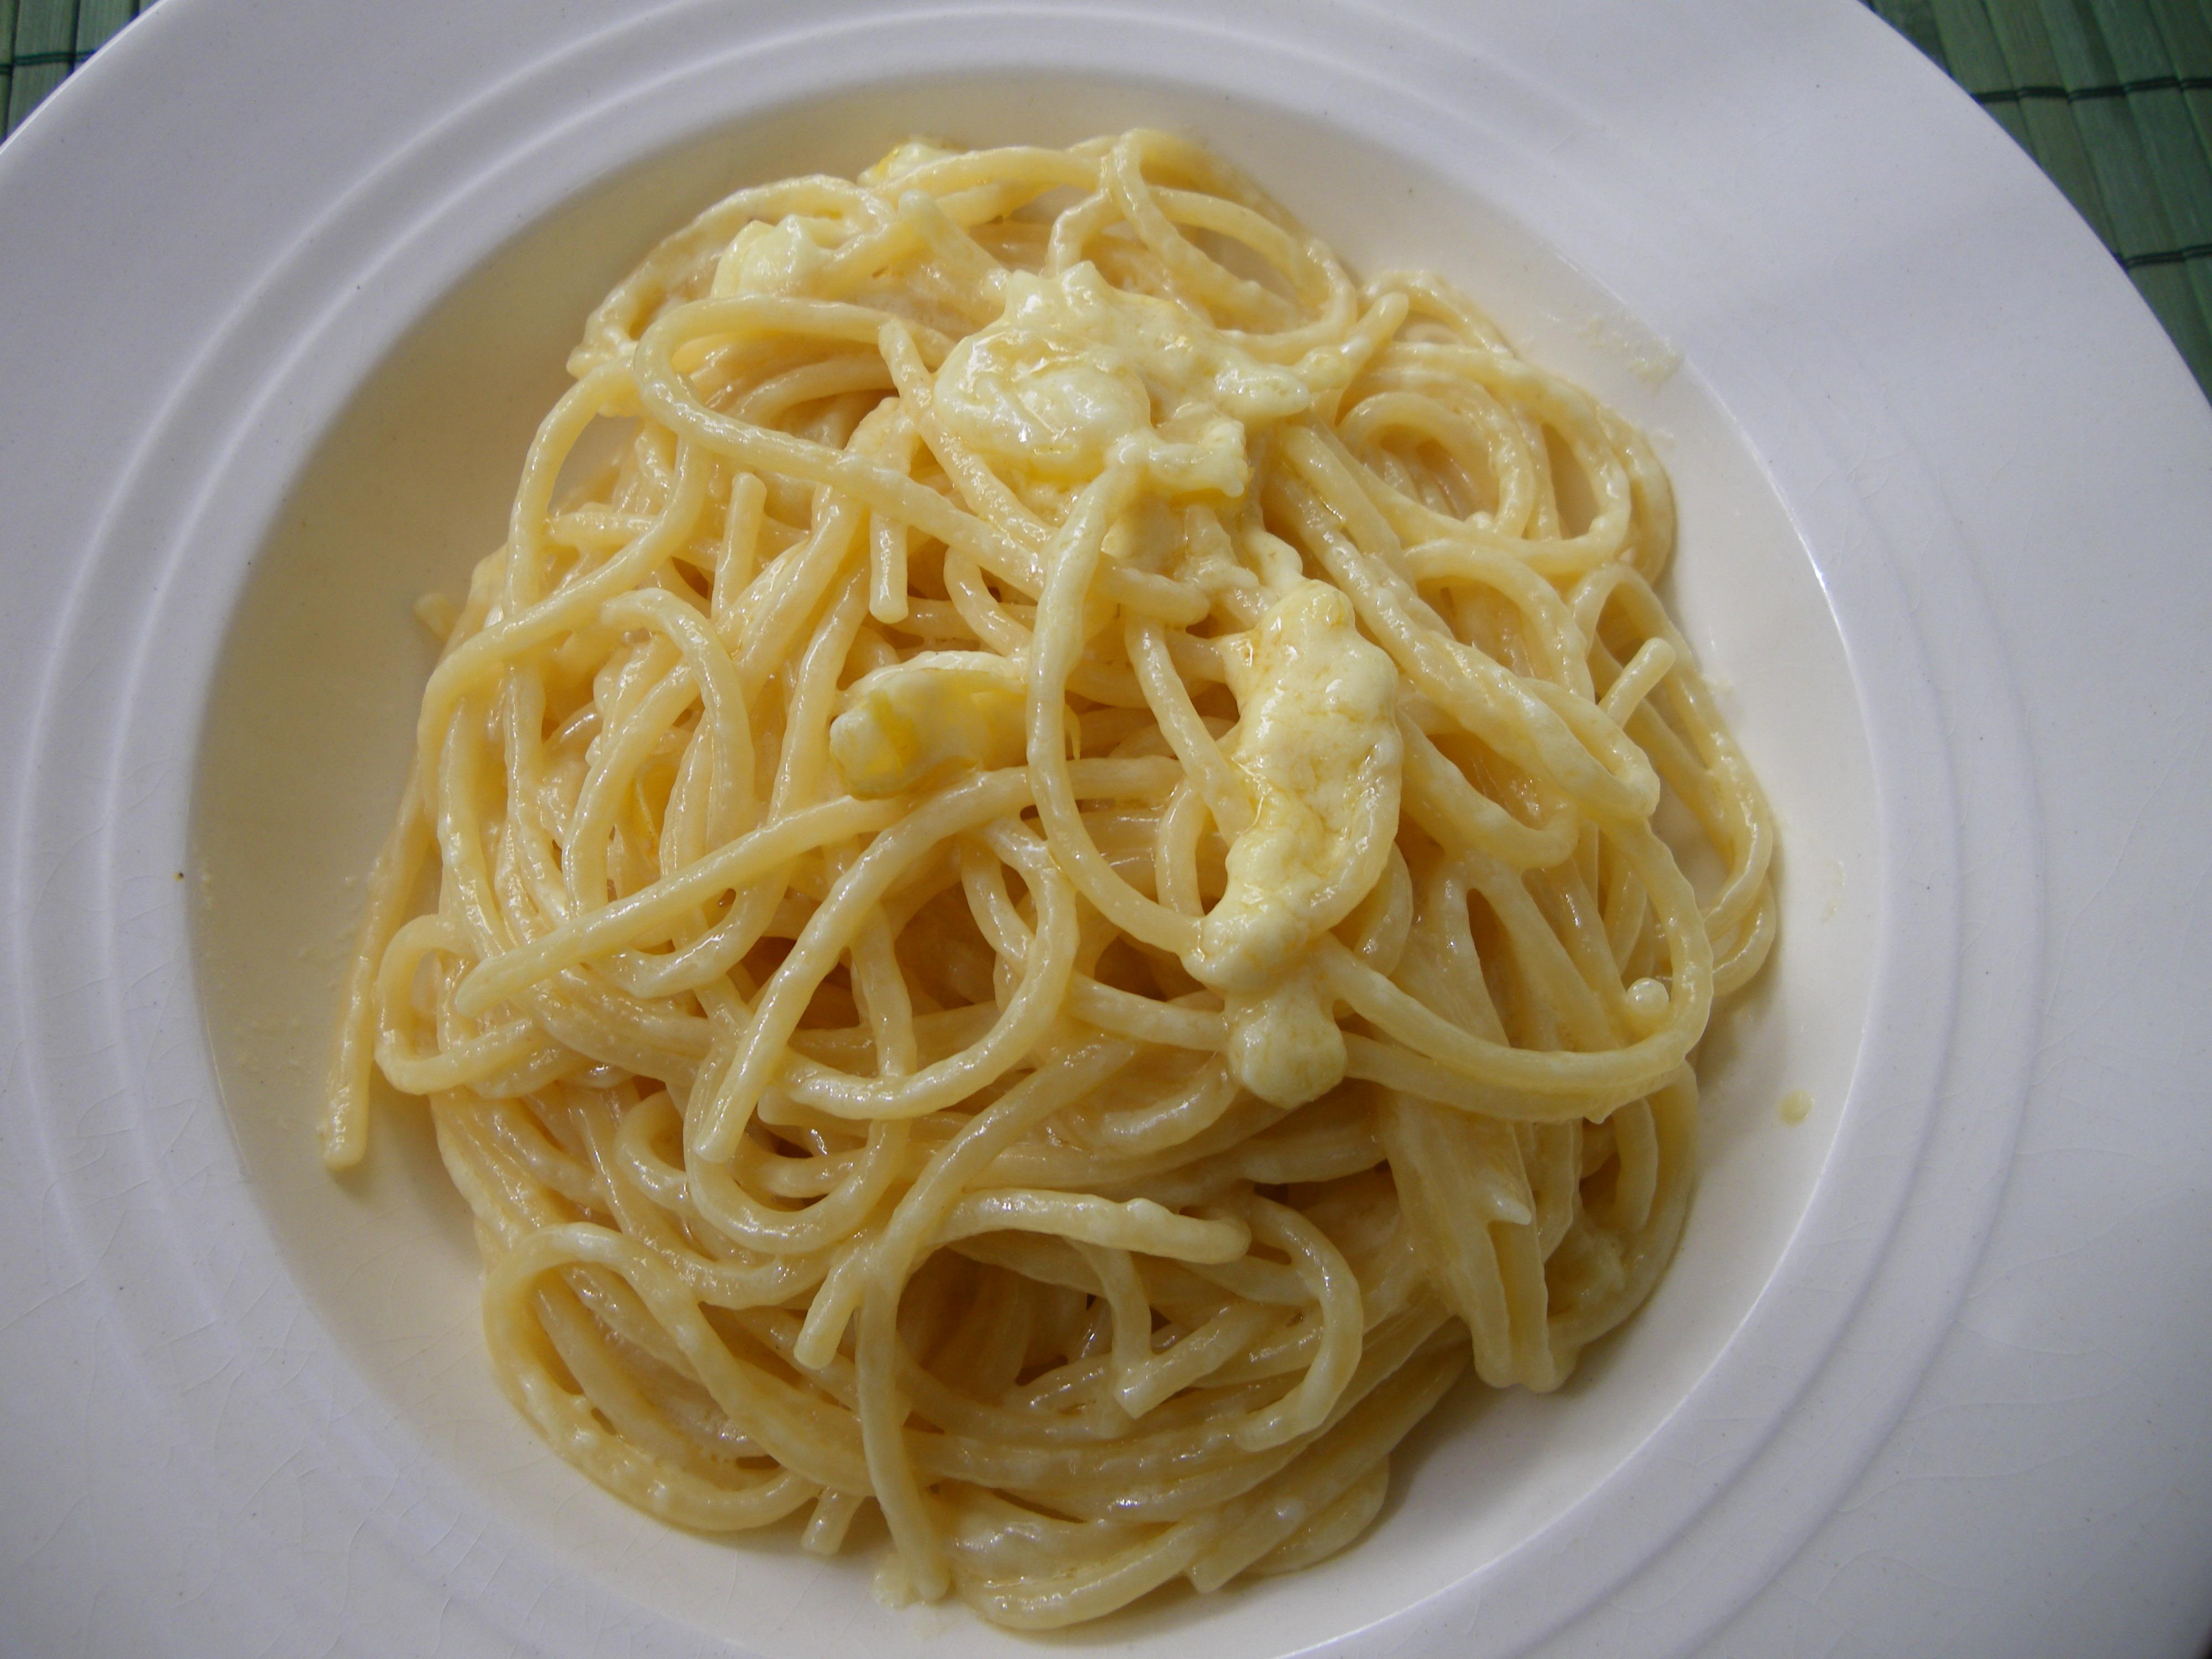 Pasta with caciocavallo & lemon